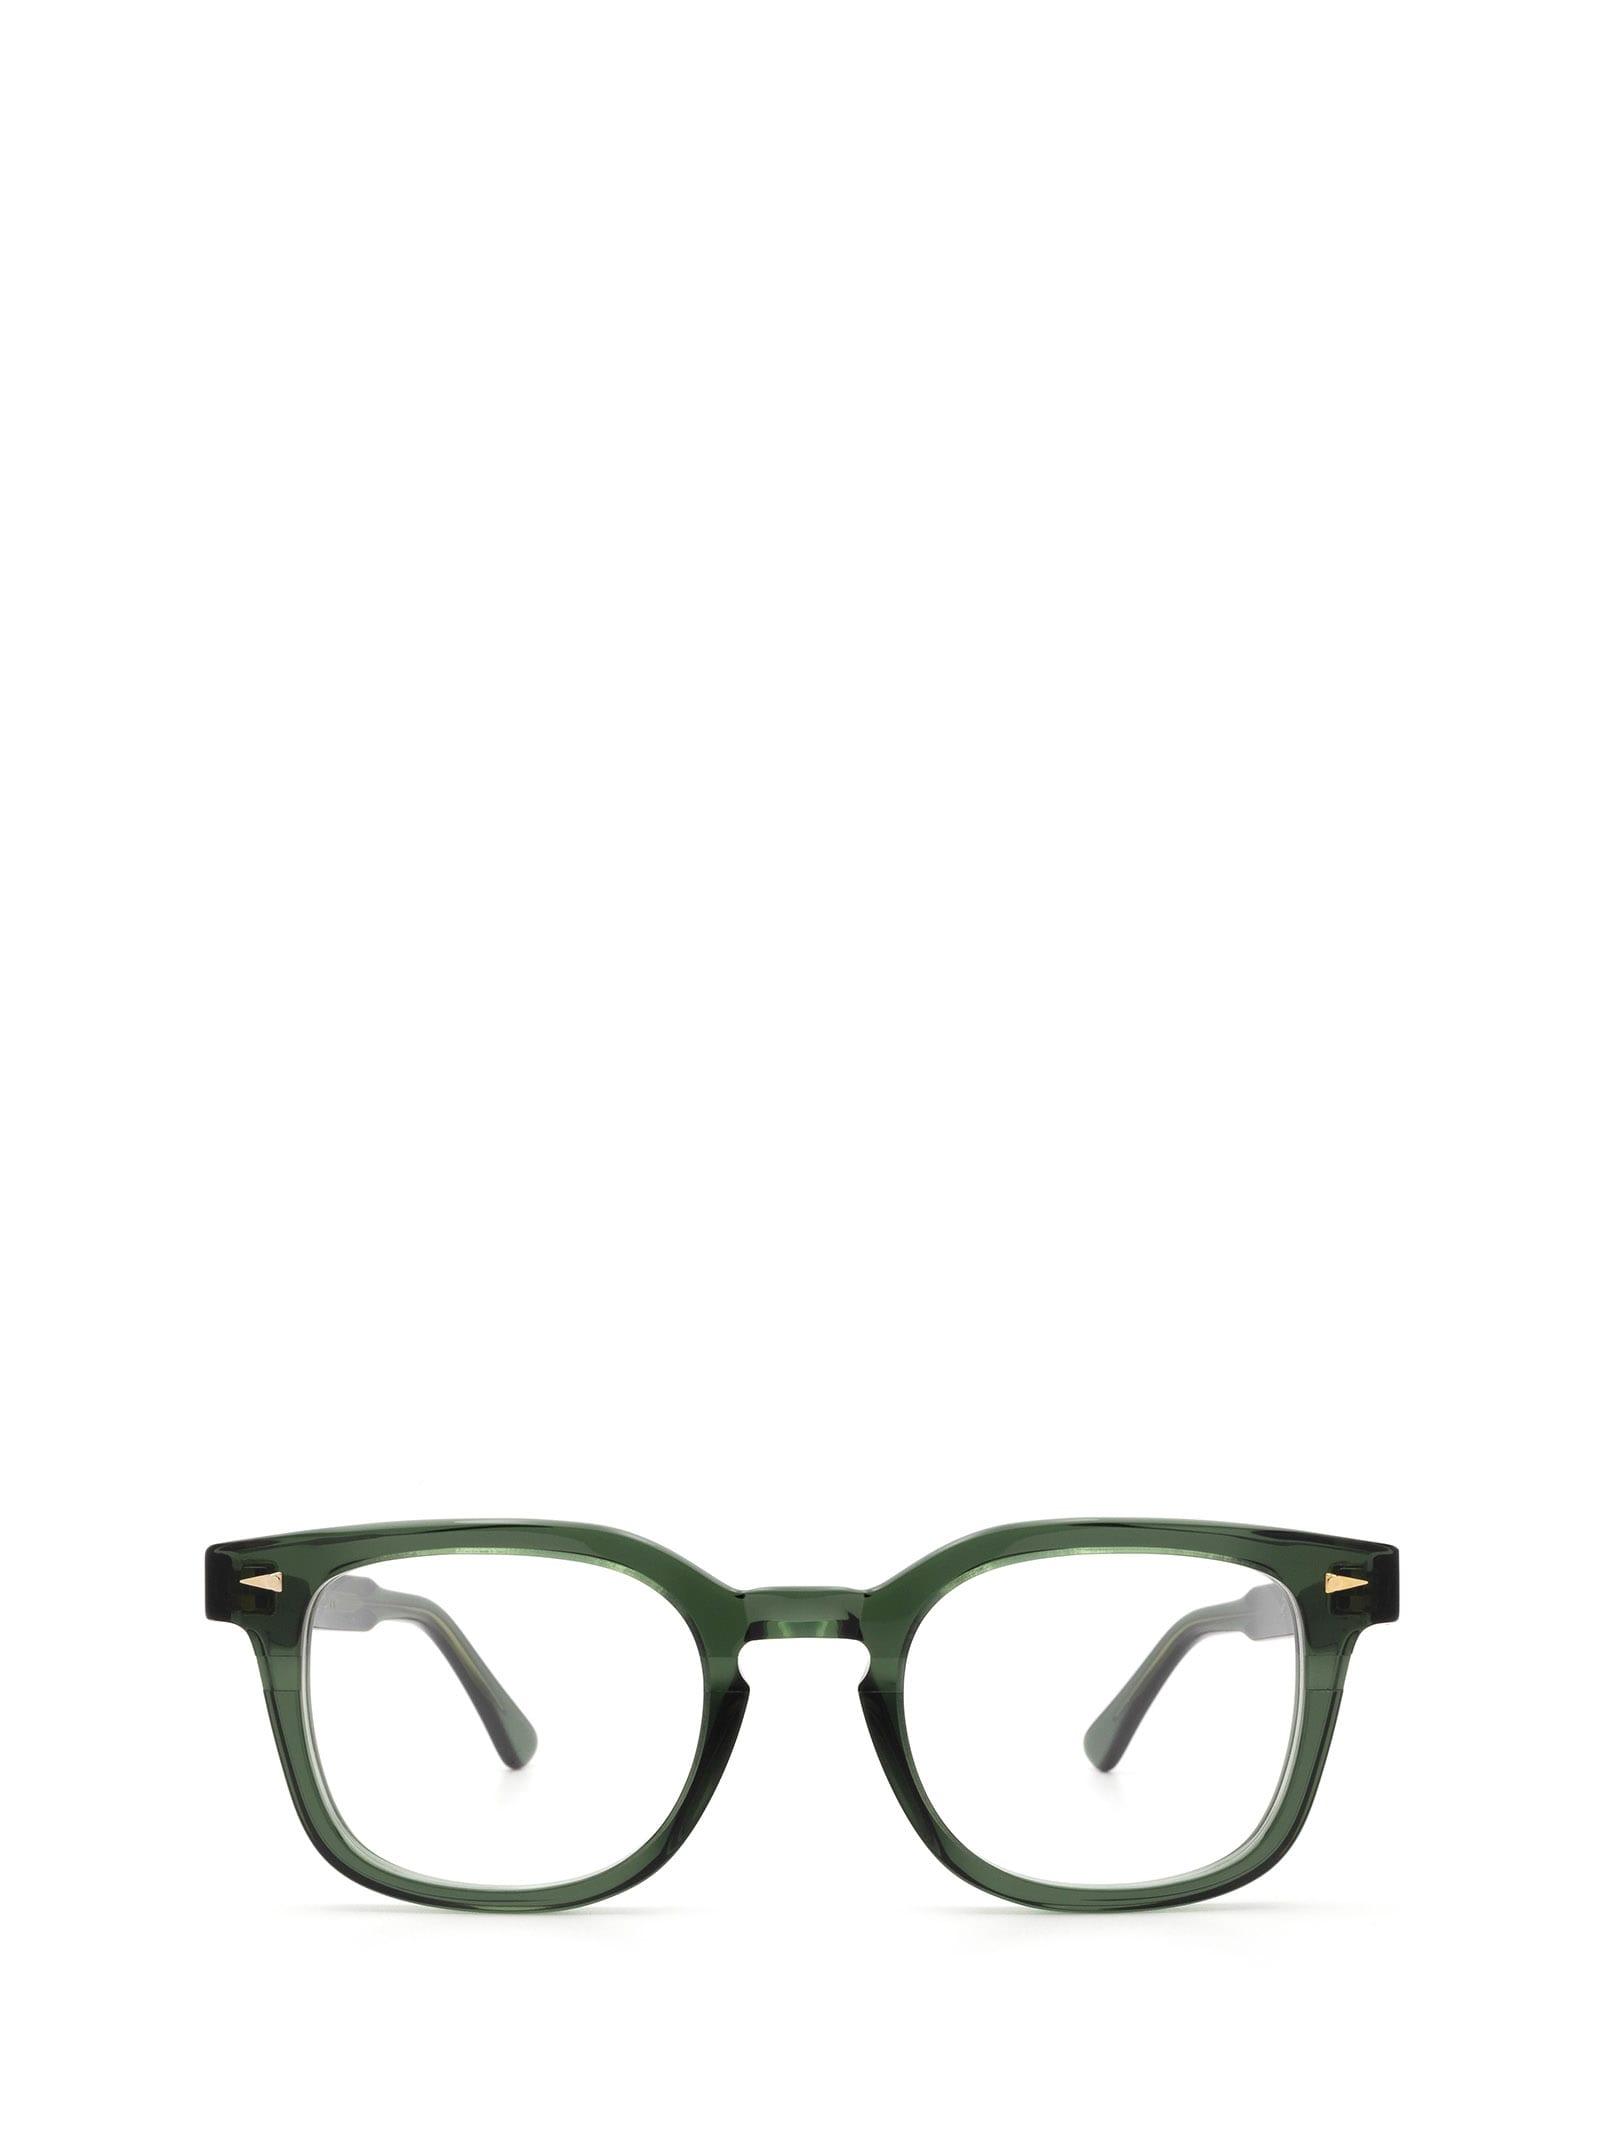 AHLEM Ahlem Rue Servan Optic Dark Green Glasses